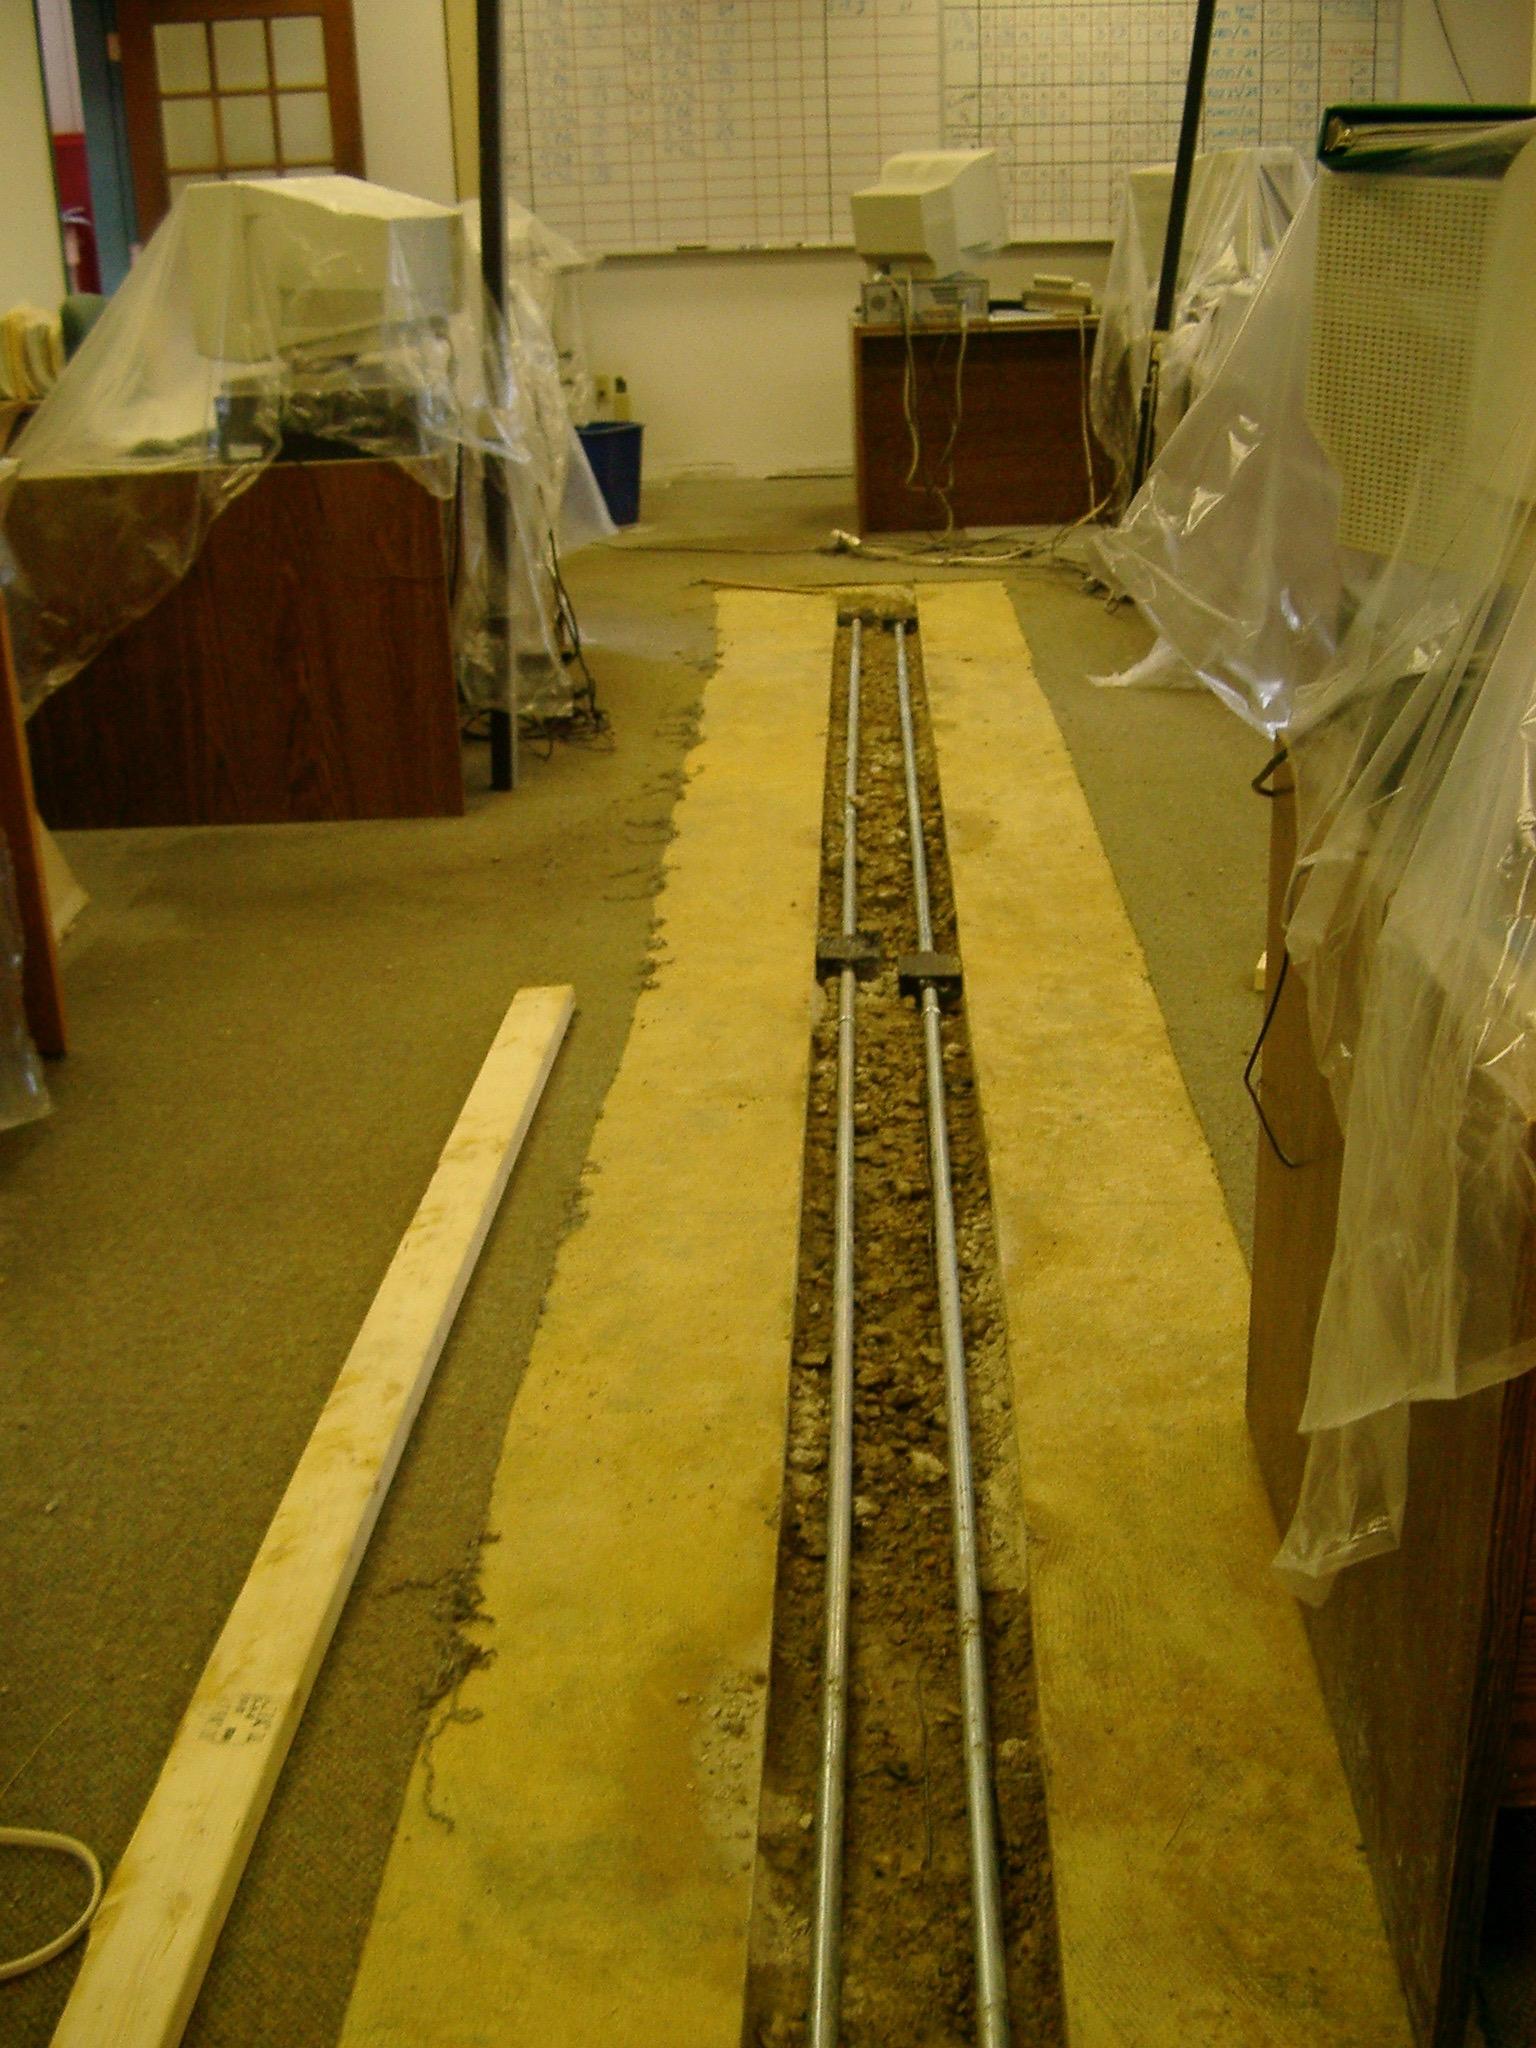 EL06  Electrical - General Contractors Commercial Renovations in Edmonton, Office and Warehouse Project Contractors